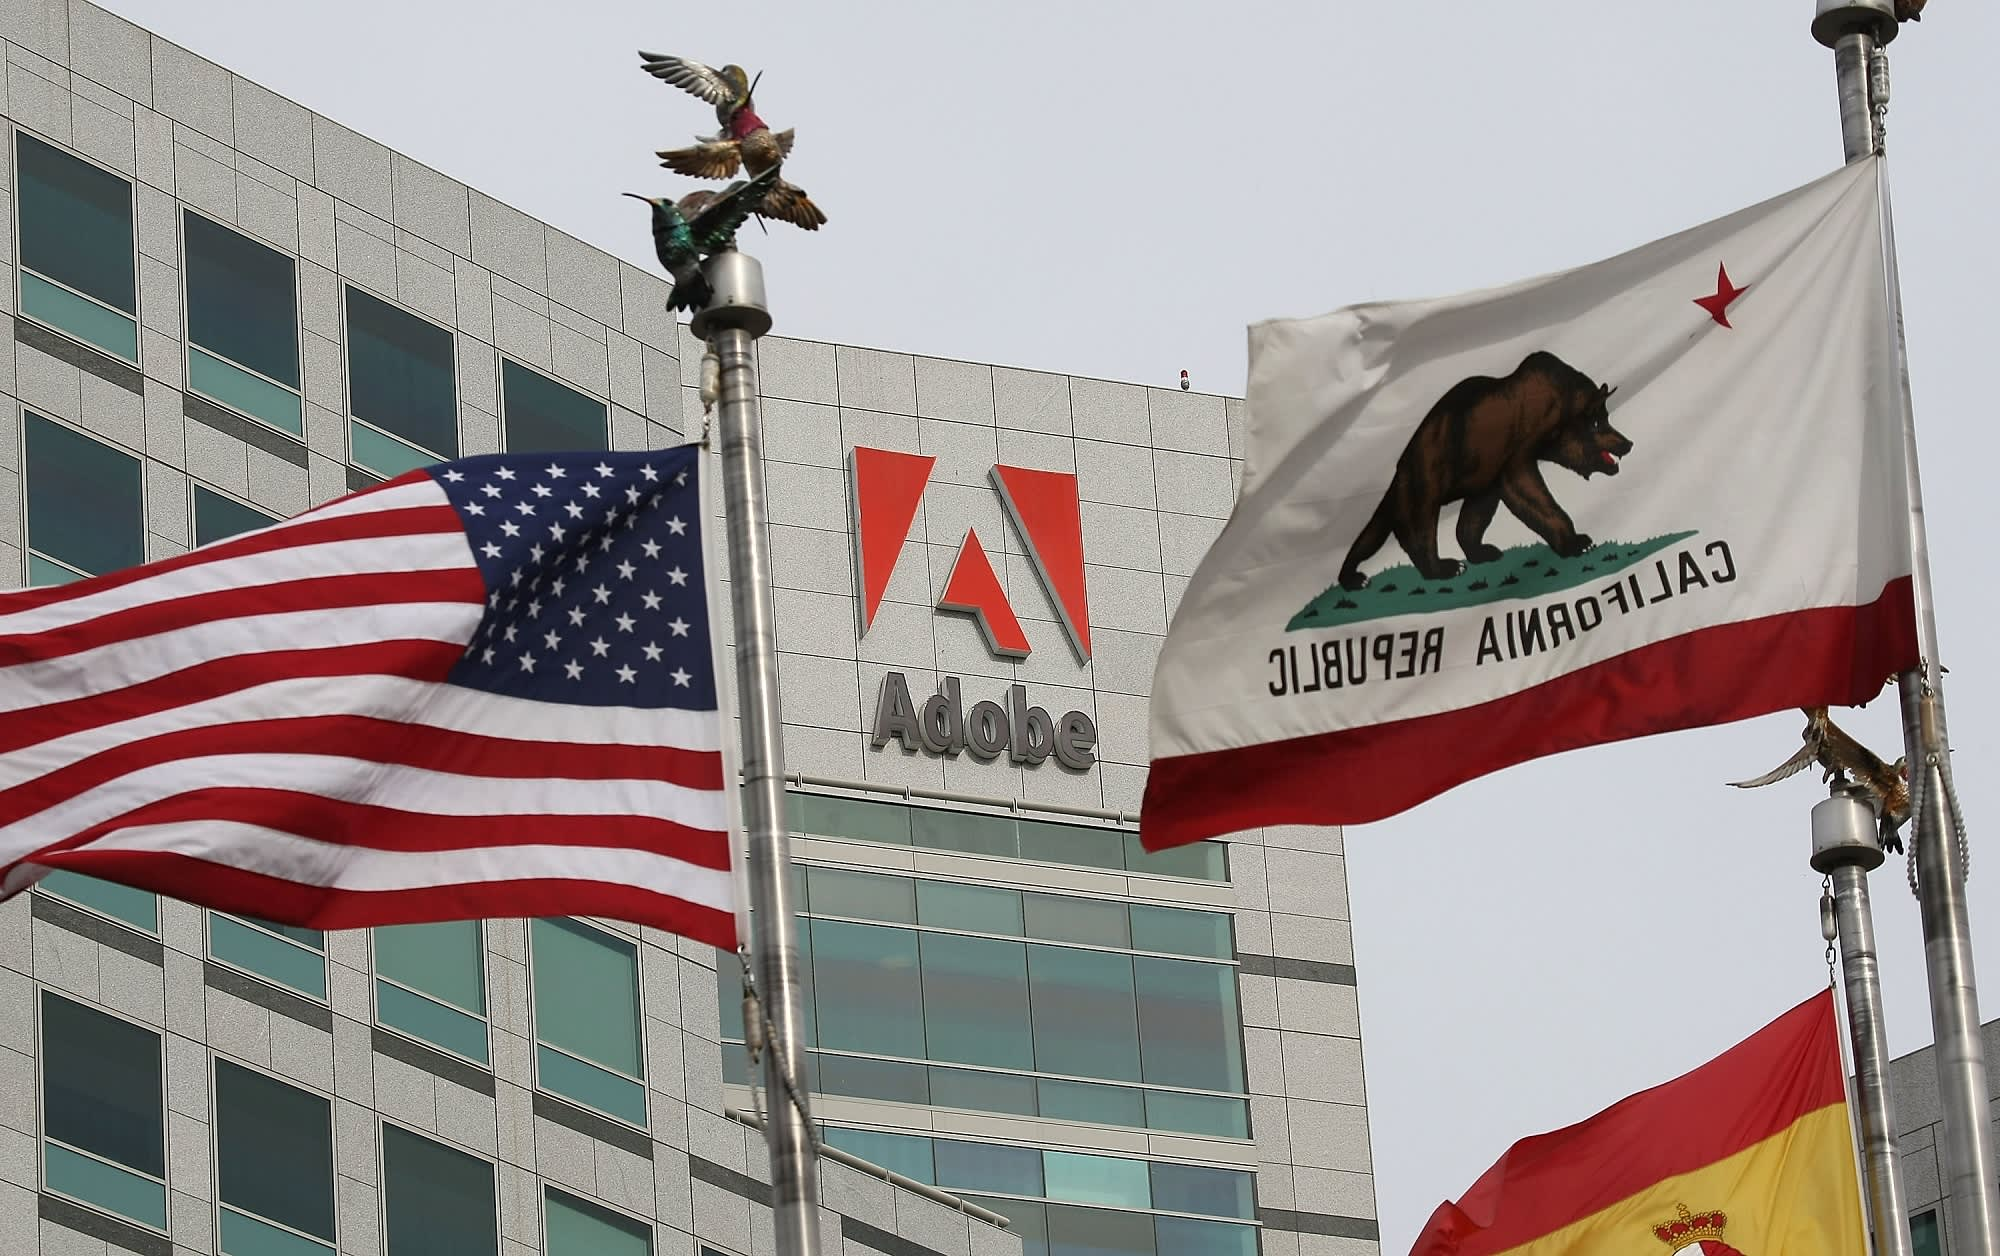 Subs: Adobe headquarters